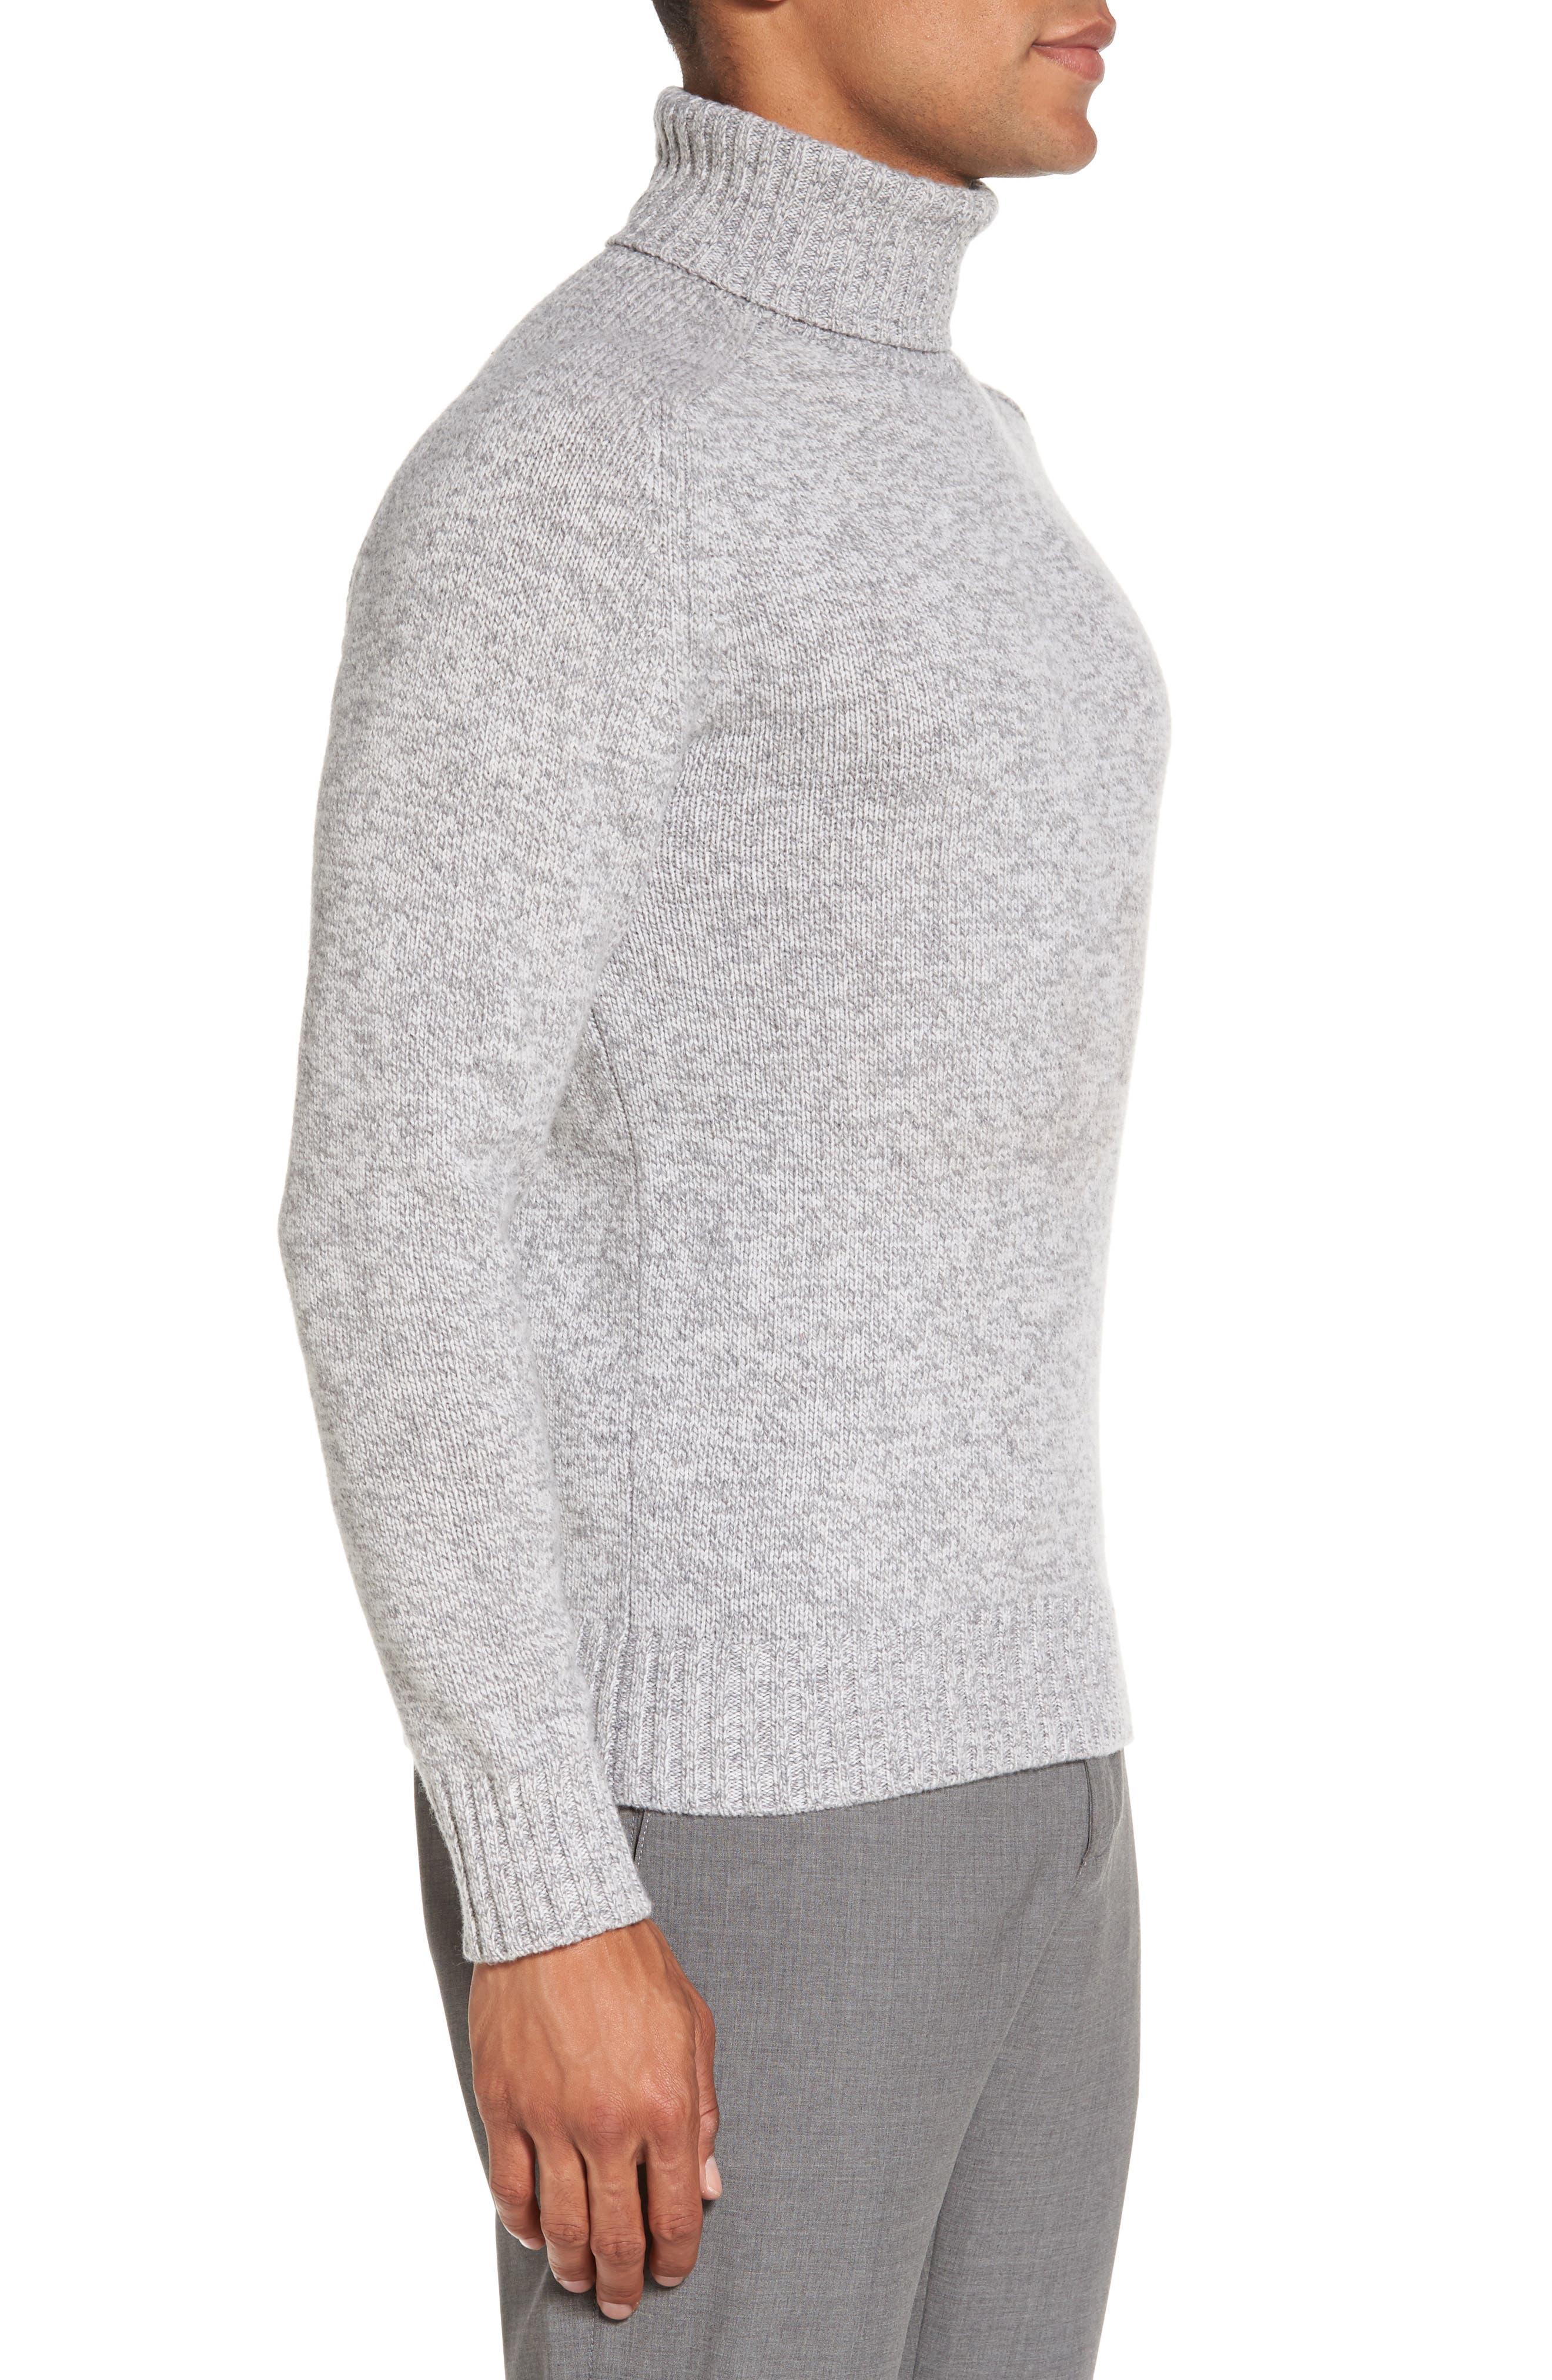 Marled Turtleneck Sweater,                             Alternate thumbnail 3, color,                             Light Grey/ Dark Grey